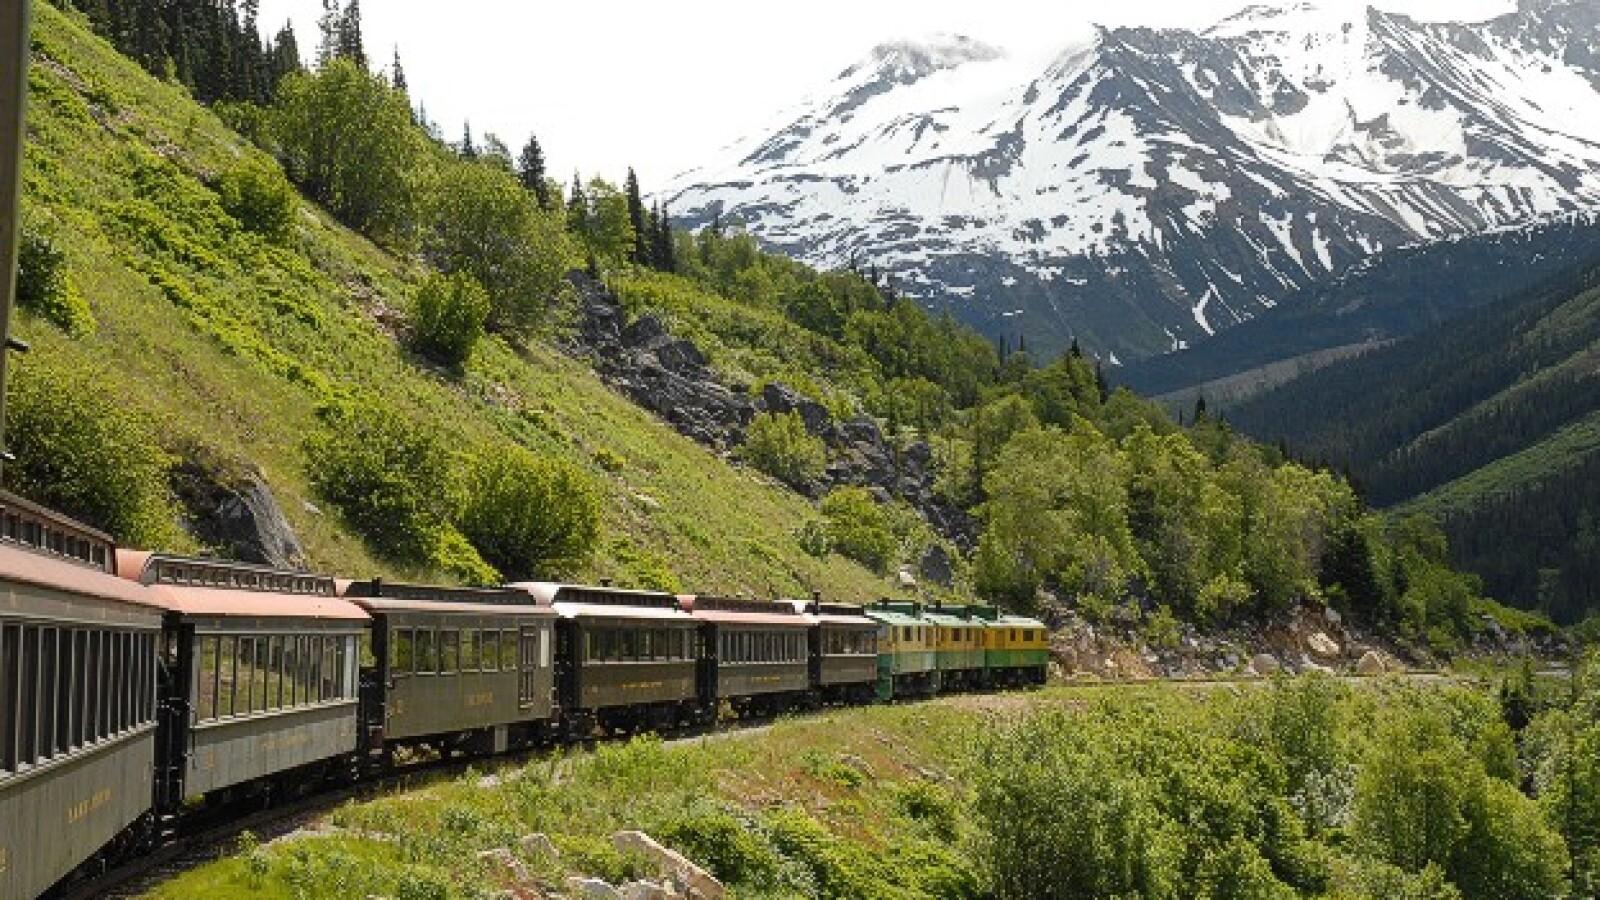 Ferrocarril White Pass y Yukon